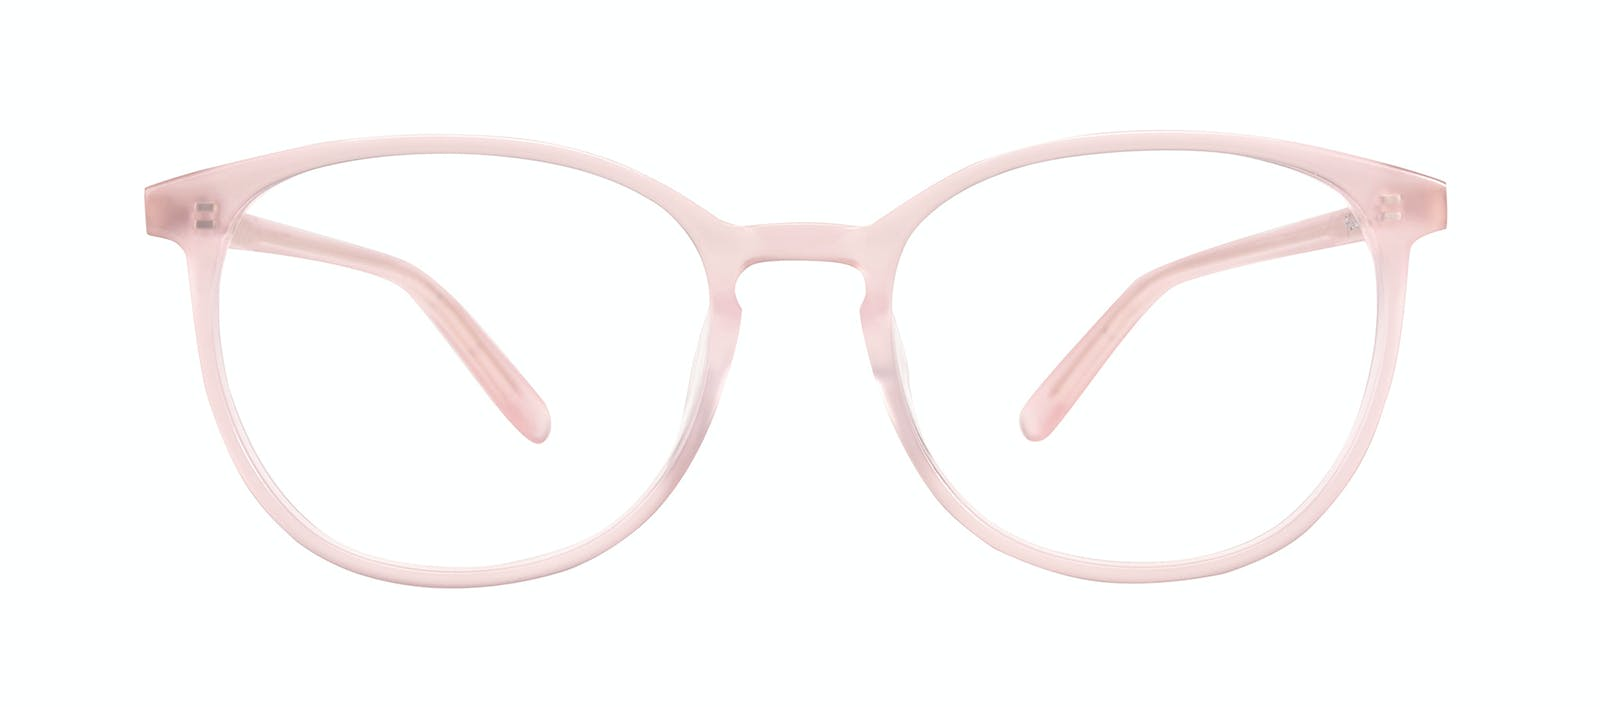 2767e08de9a Affordable Fashion Glasses Round Eyeglasses Women Femme Libre Mila Front